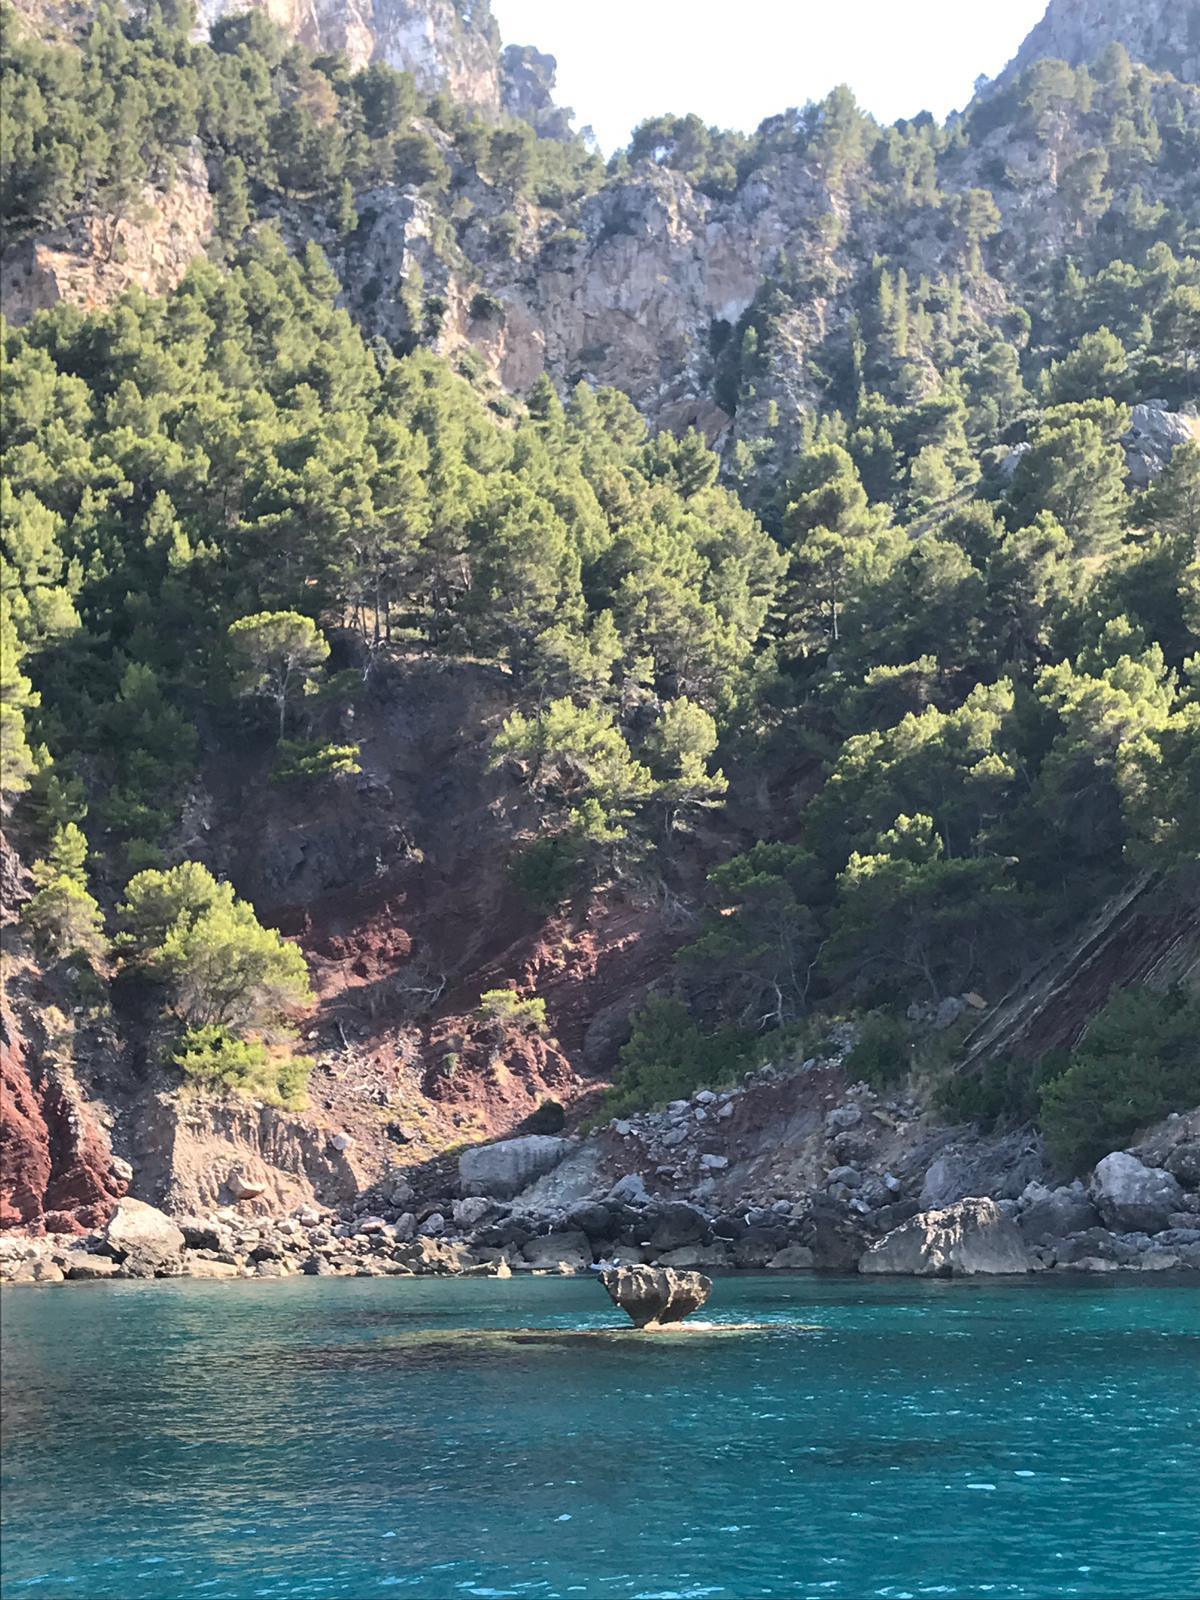 Mermaids Island